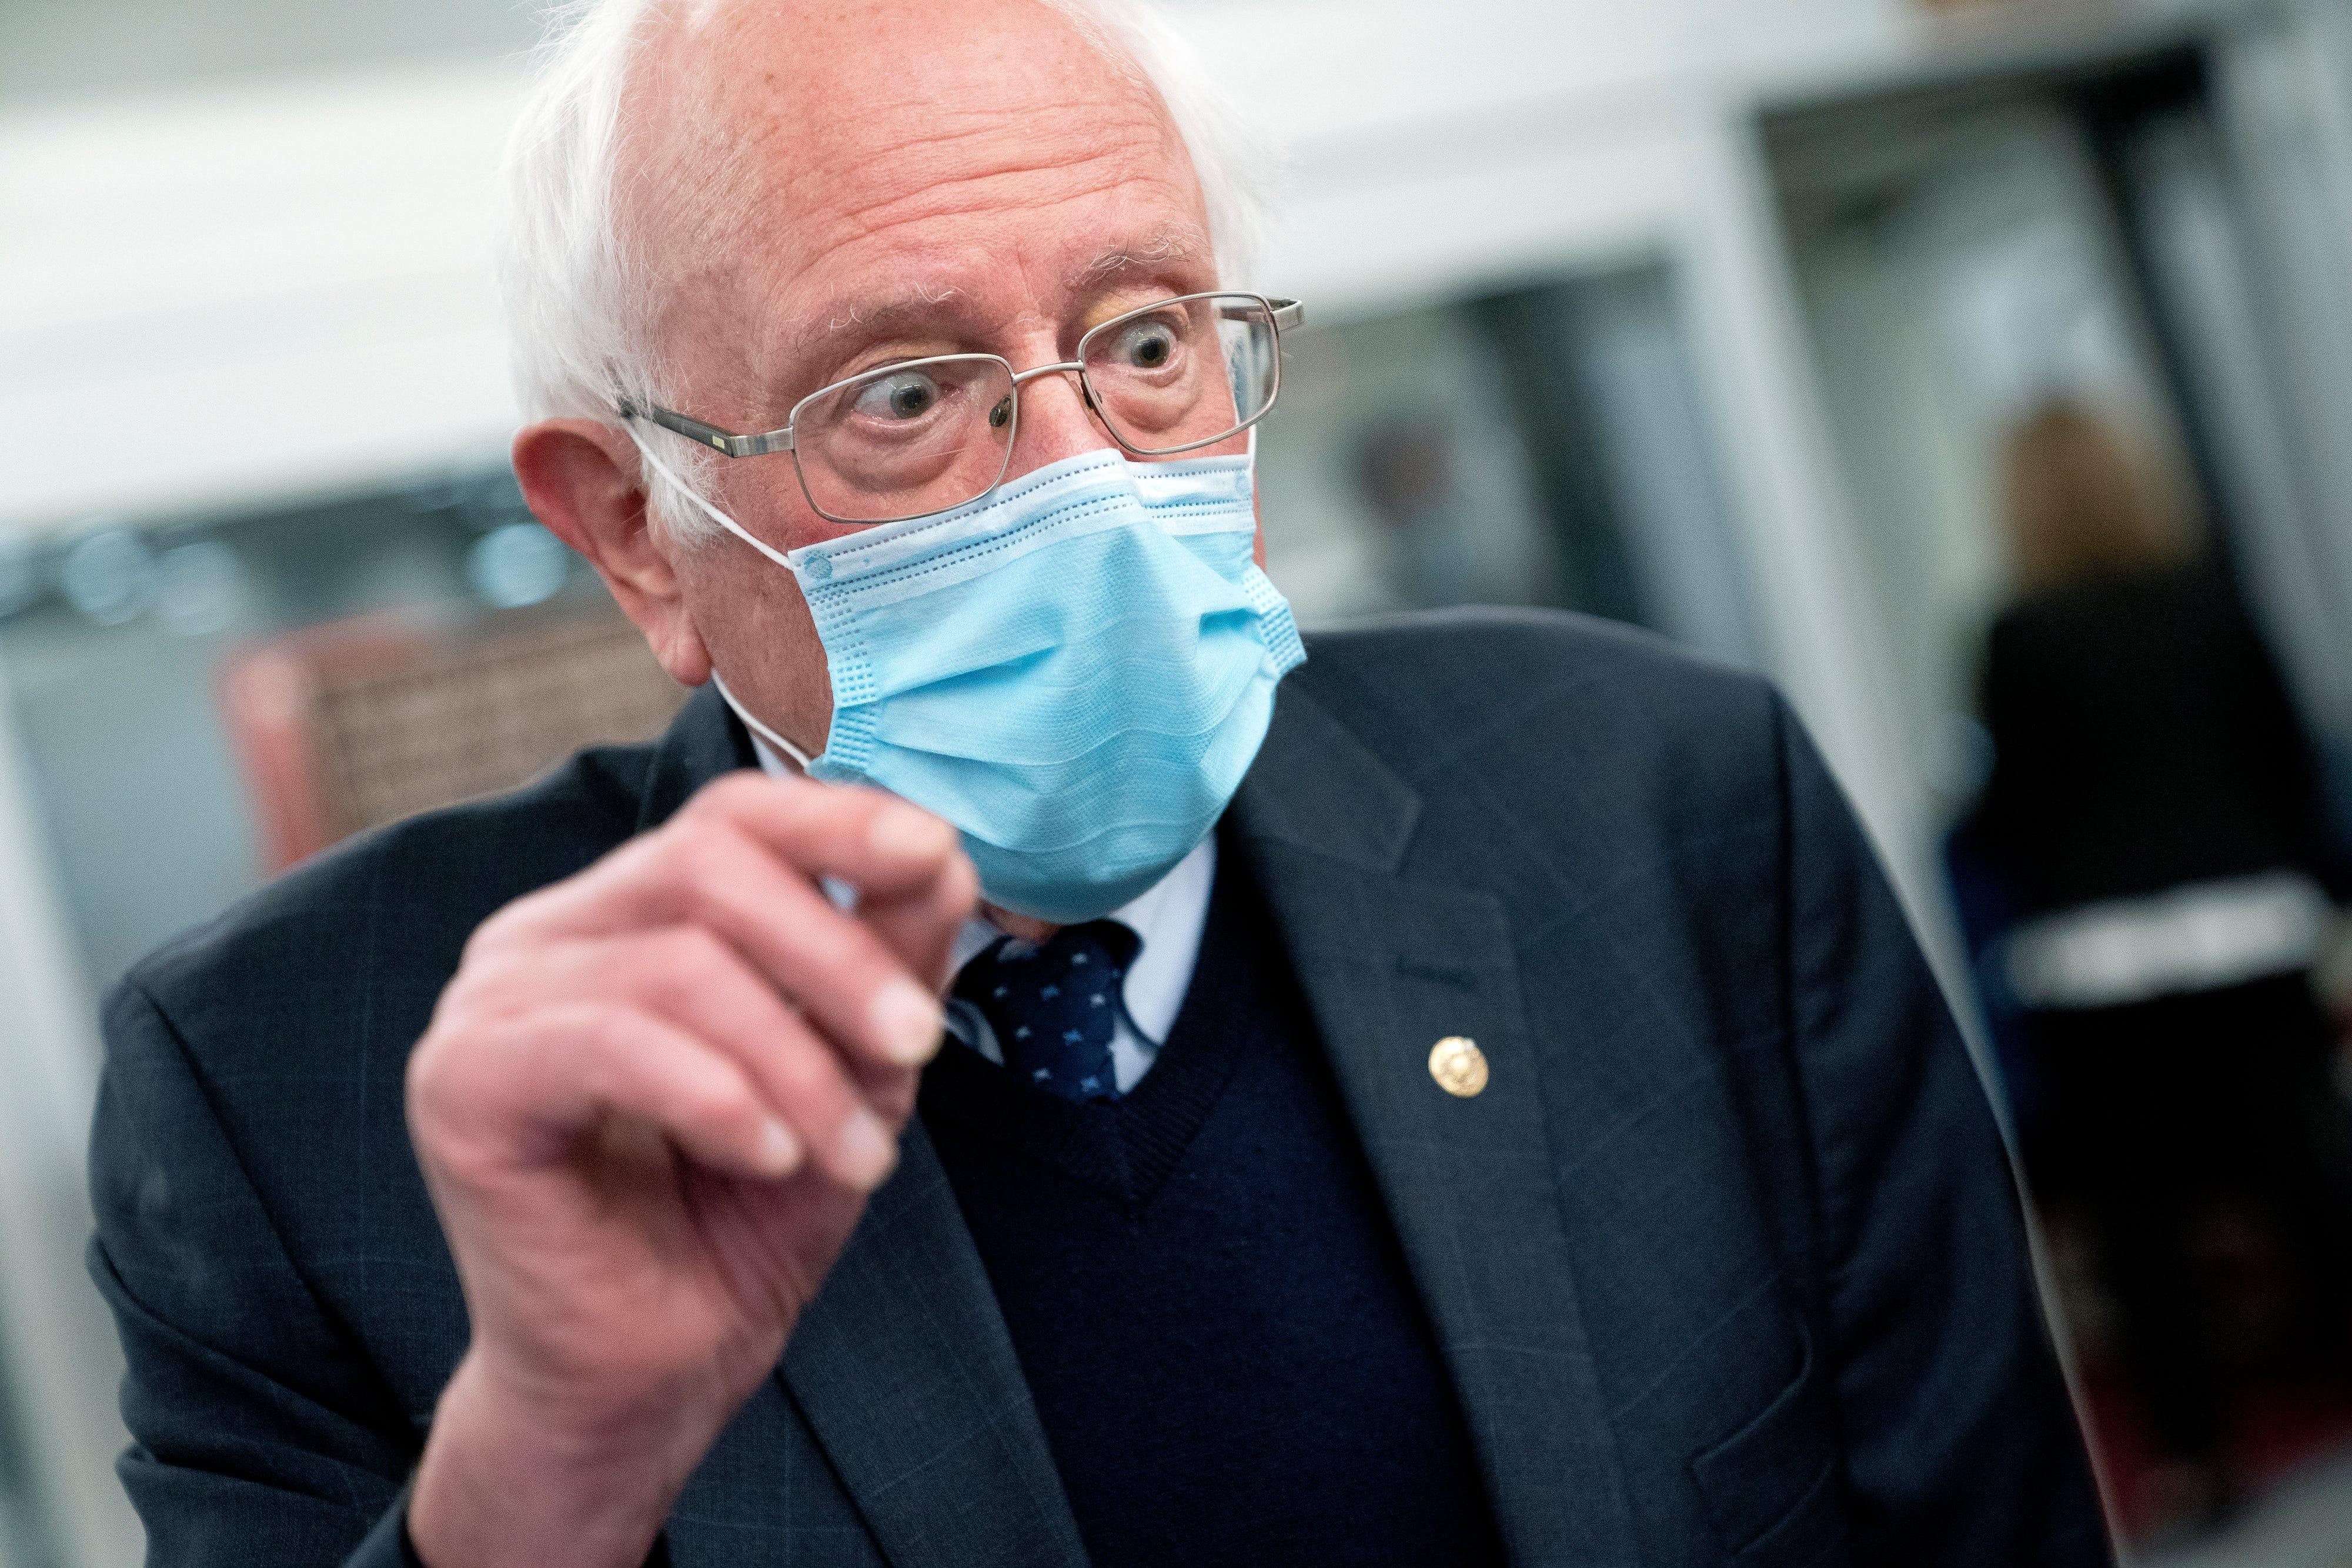 Democrats pressure Biden to include Medicare expansion, prescription drugs in his American Families Plan